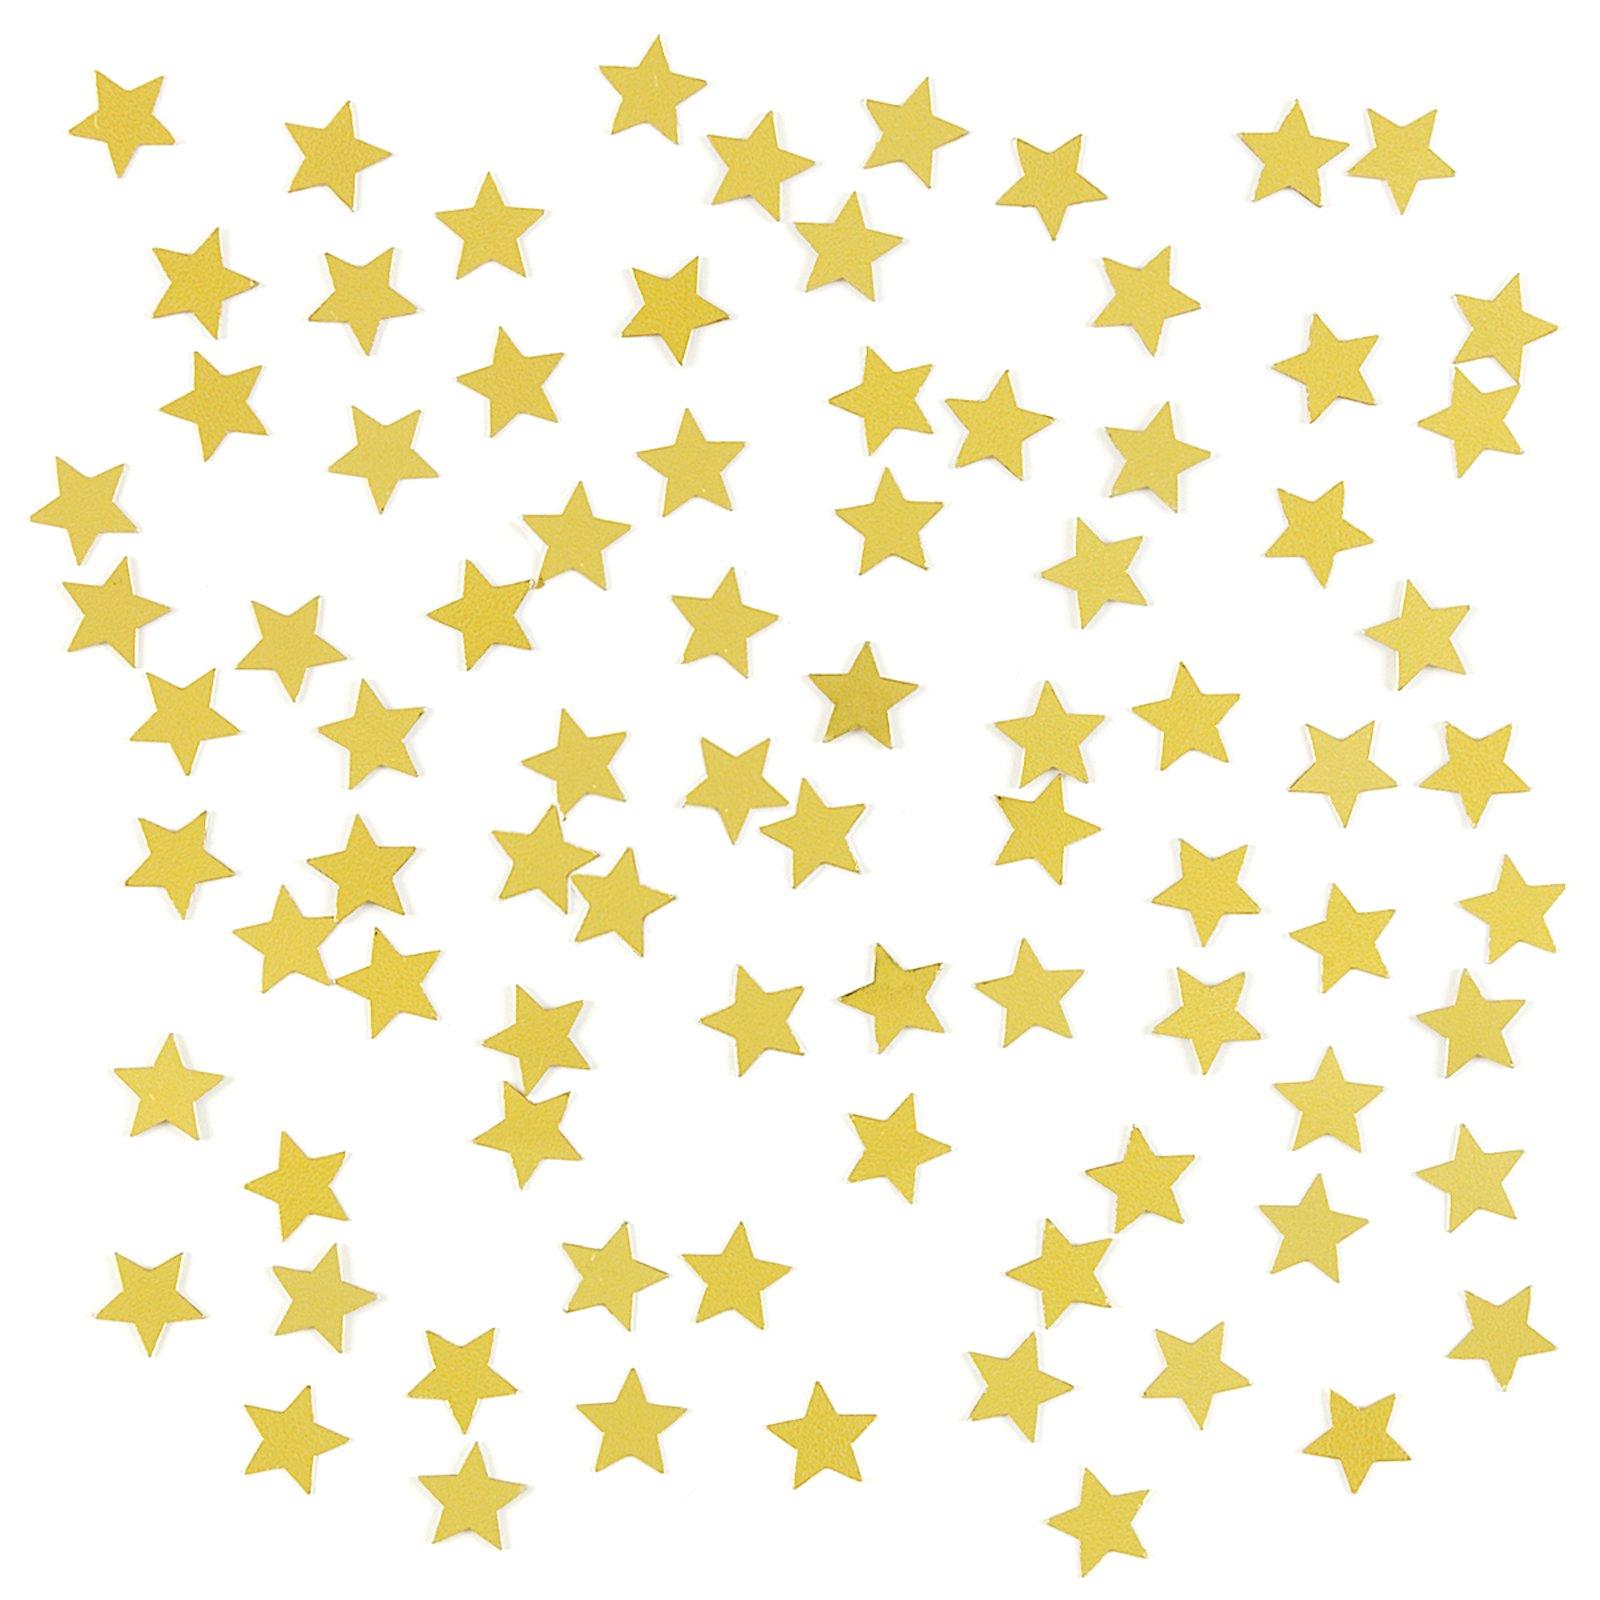 Gold Stars iPhone 4 Wallpaper - iPhone-